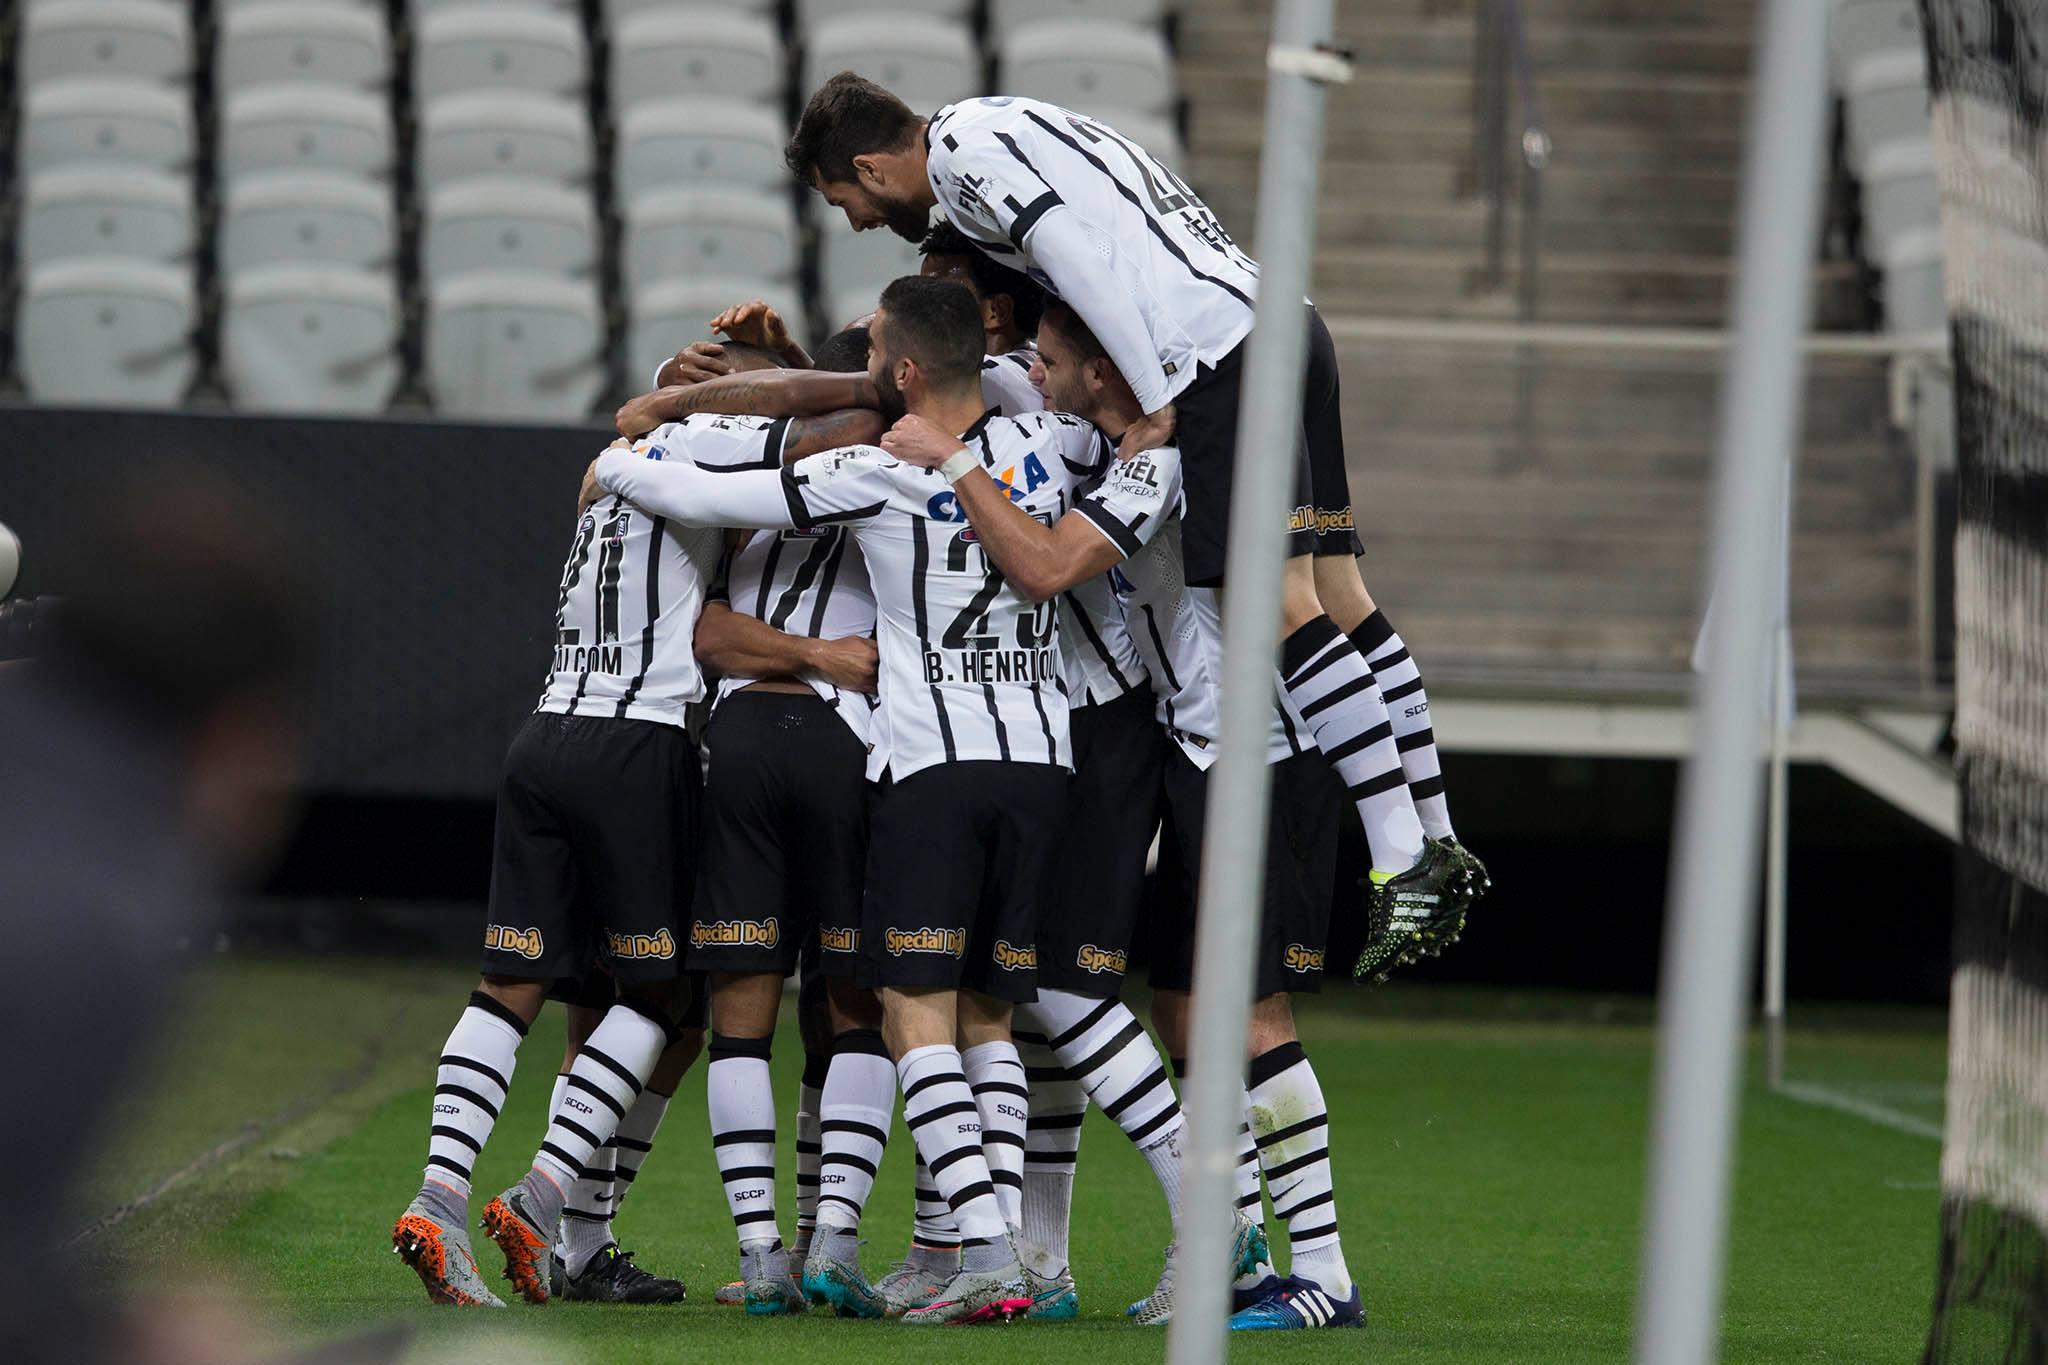 VÍDEO: Corinthians 2 x 0 Atlético-PR